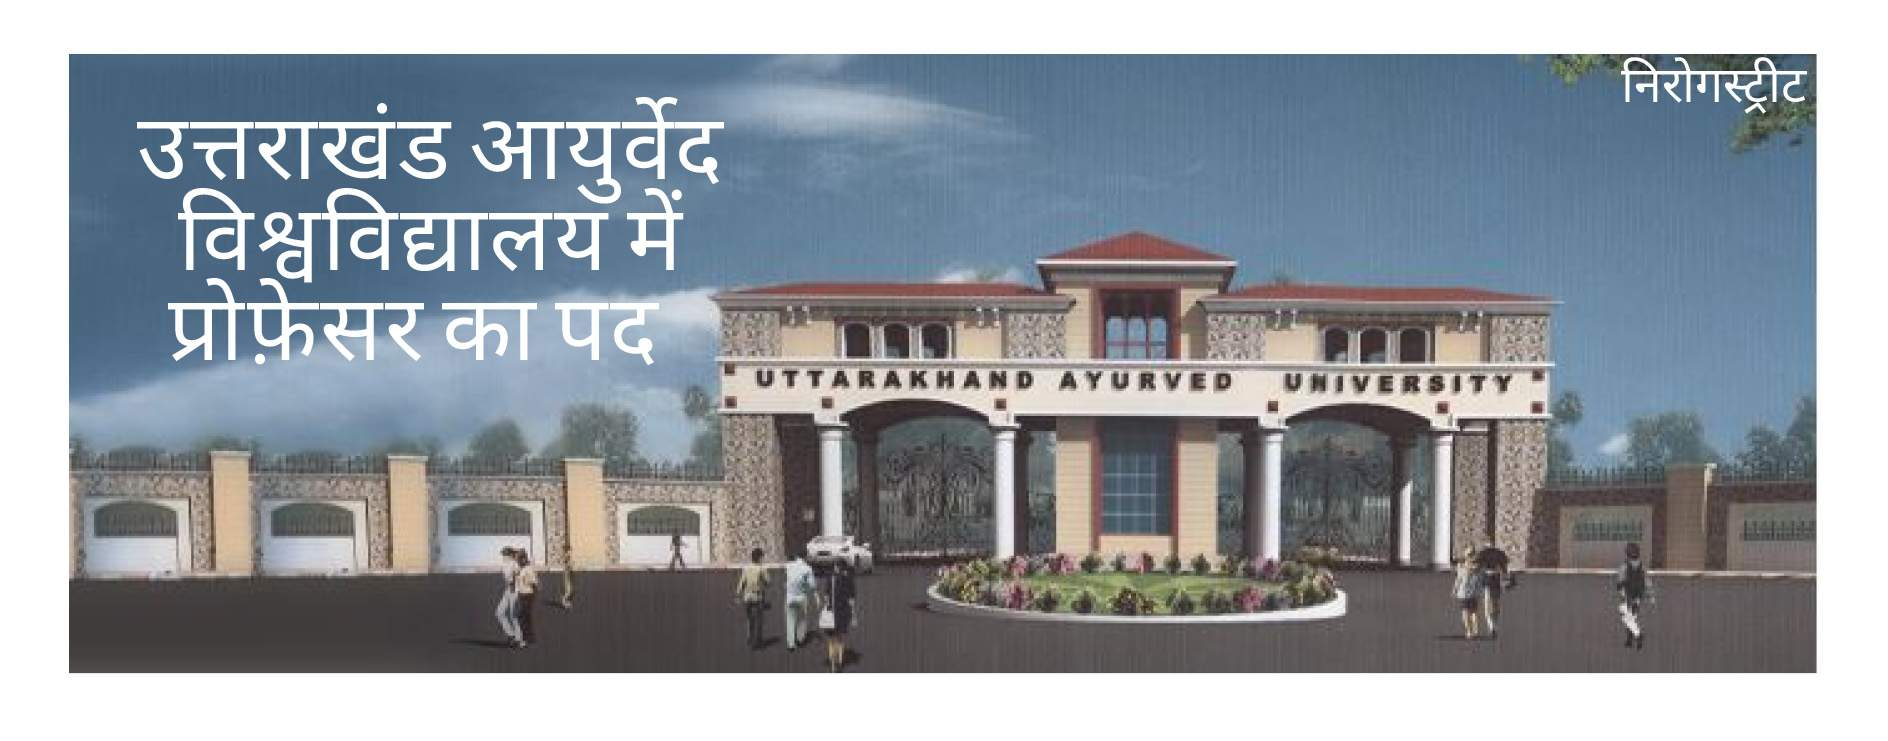 post of Professor in uttarakhand ayurveda university